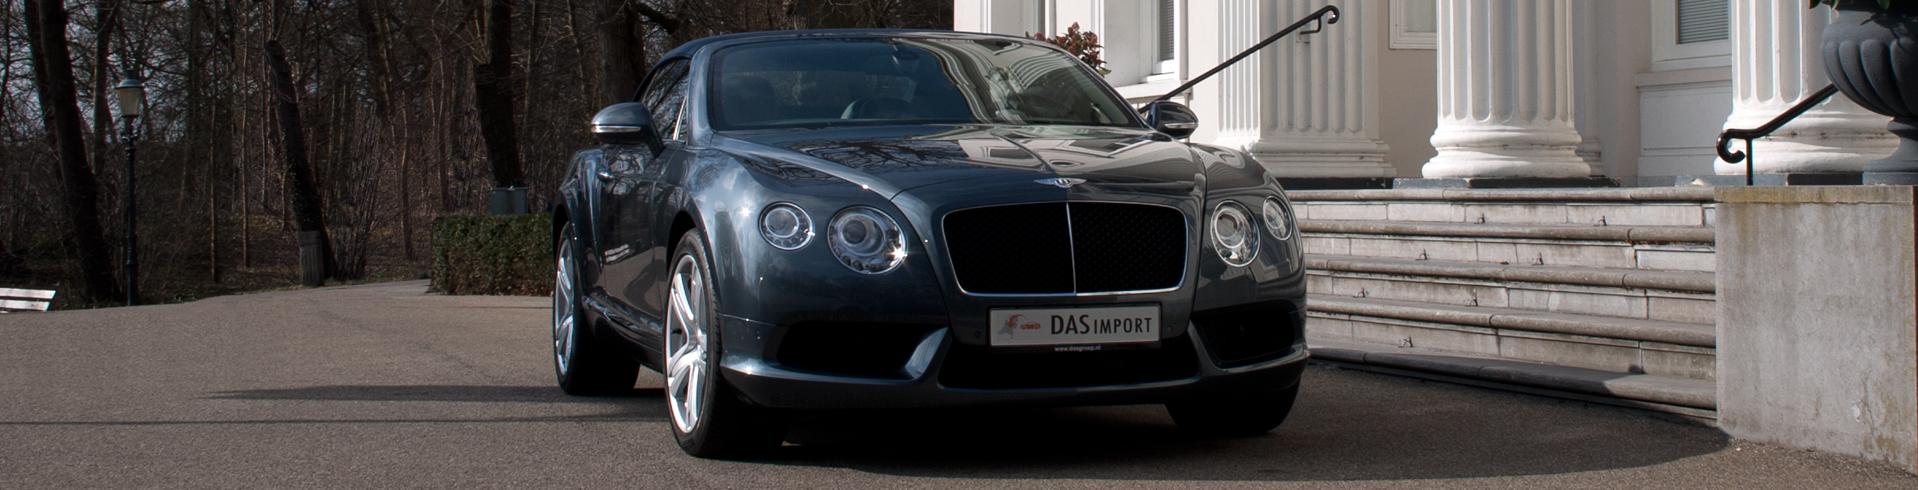 2.-Bentley-Continental-GTC